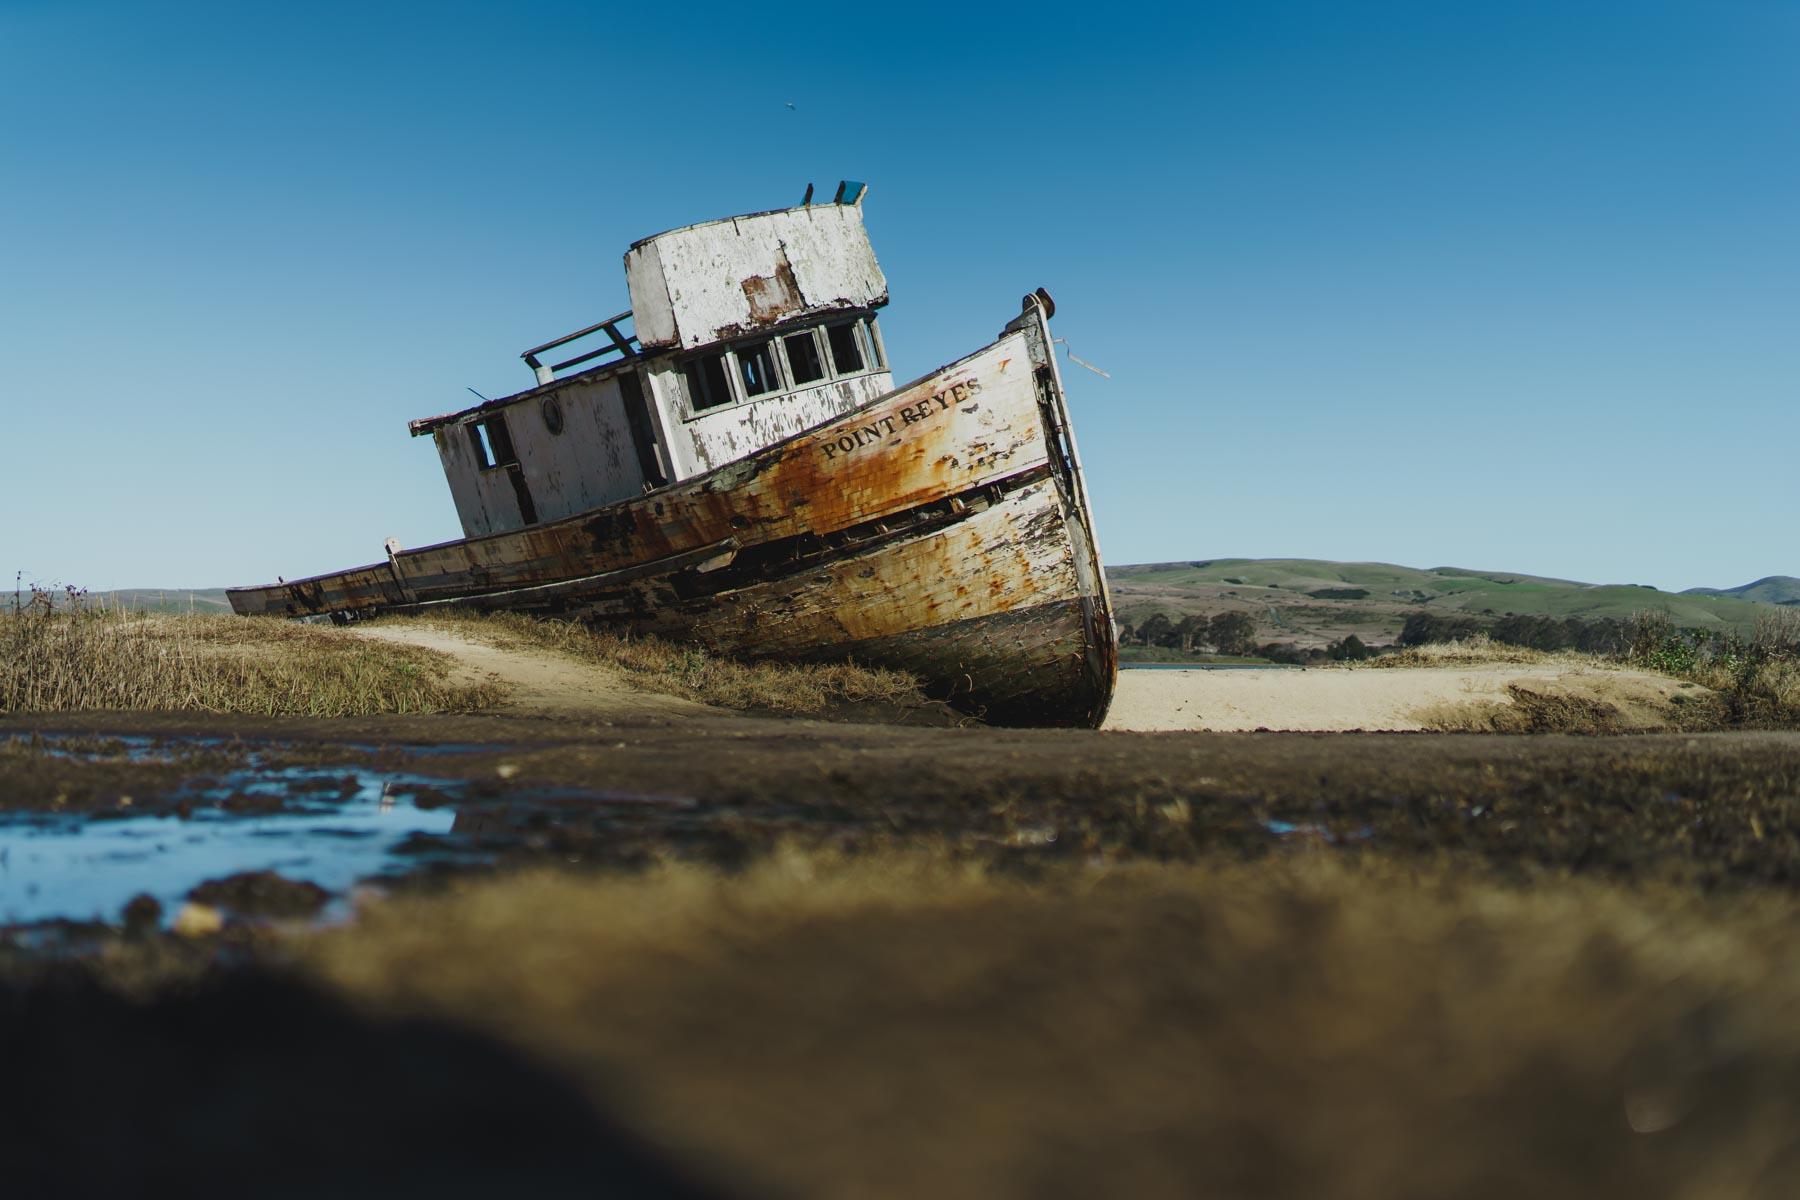 Pt. Reyes California Shipwreck  Photo by Jas Gold Jason Goldsmith